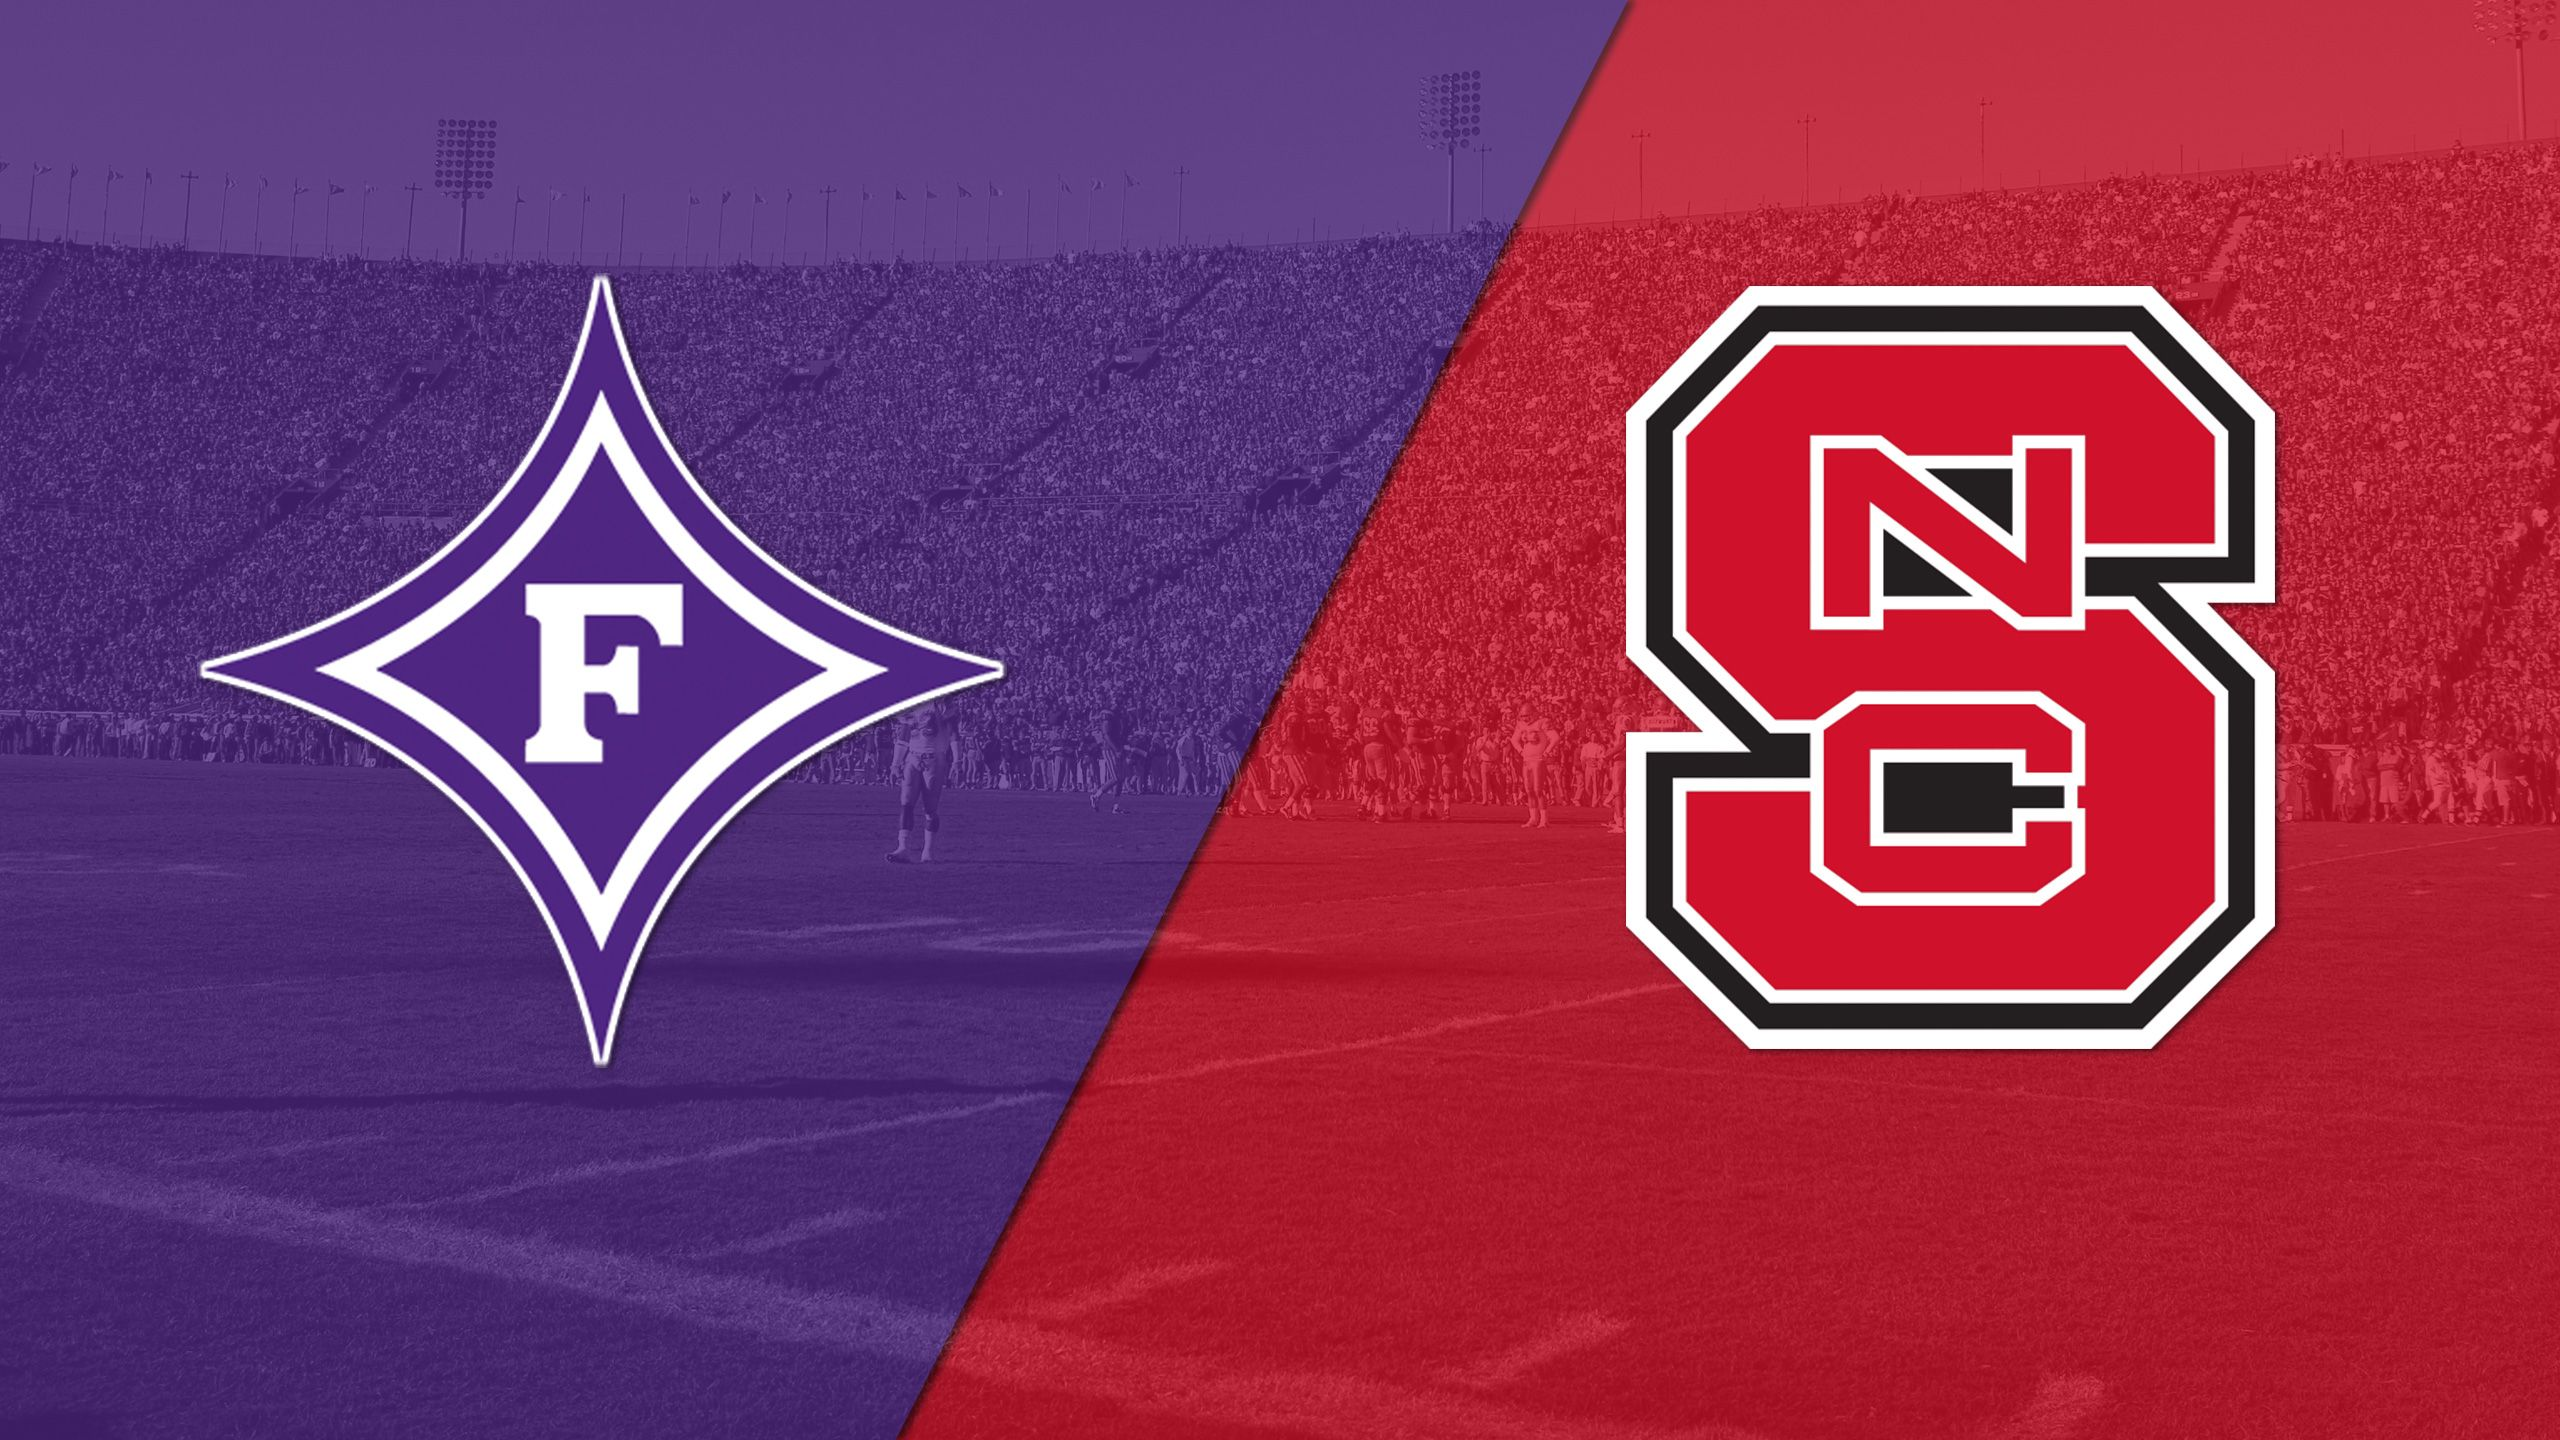 Furman vs. NC State (Football)